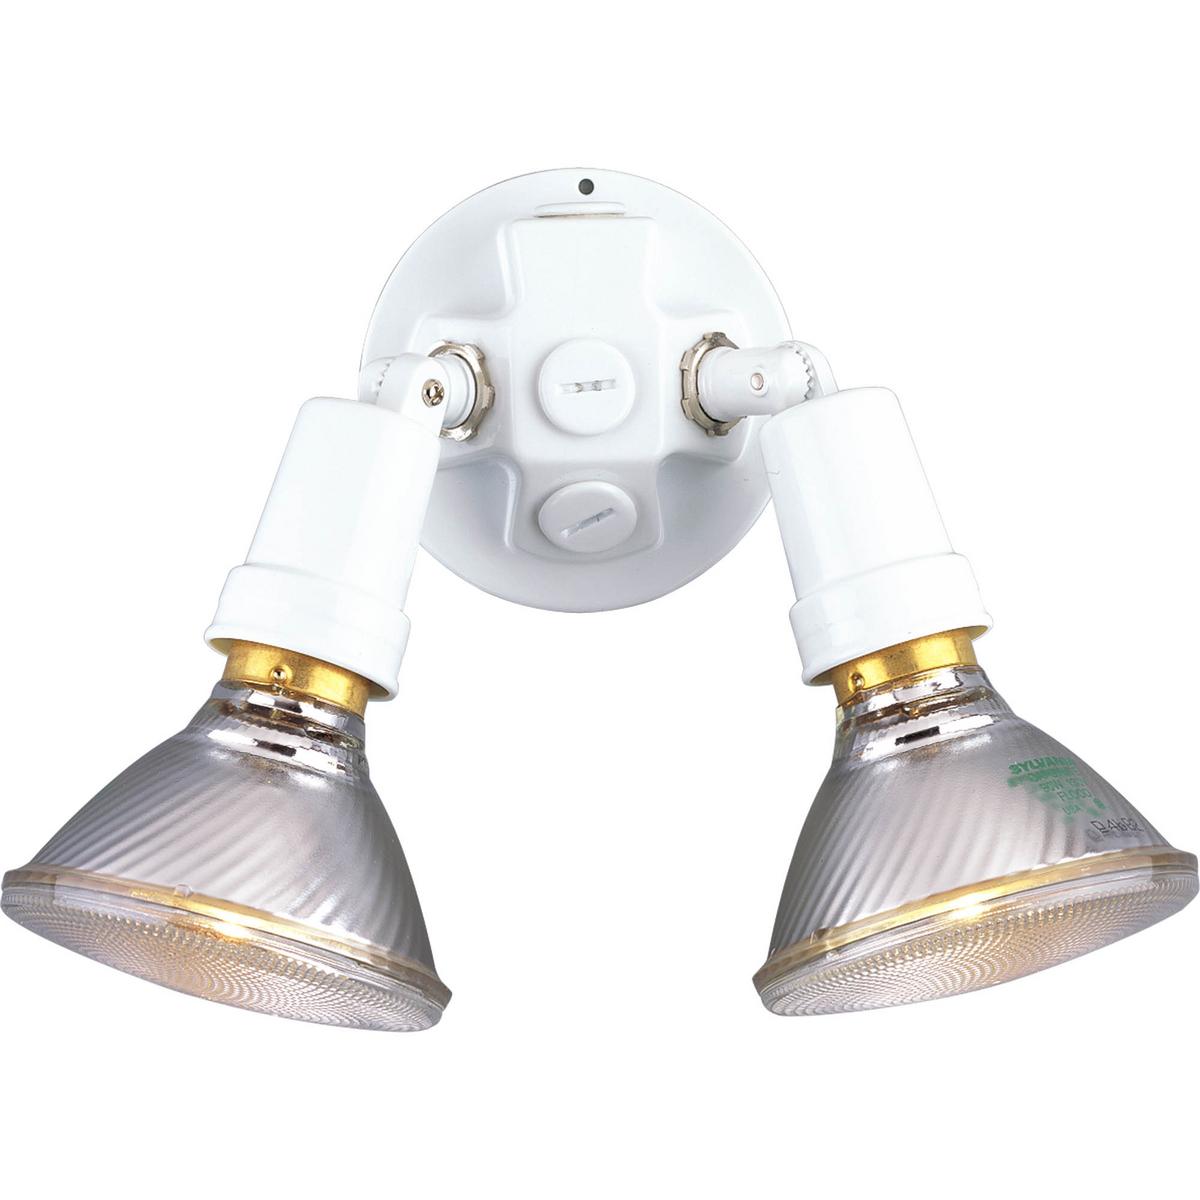 PRO P5207-30 Two Light White Outdoor Flood Light 2X150M